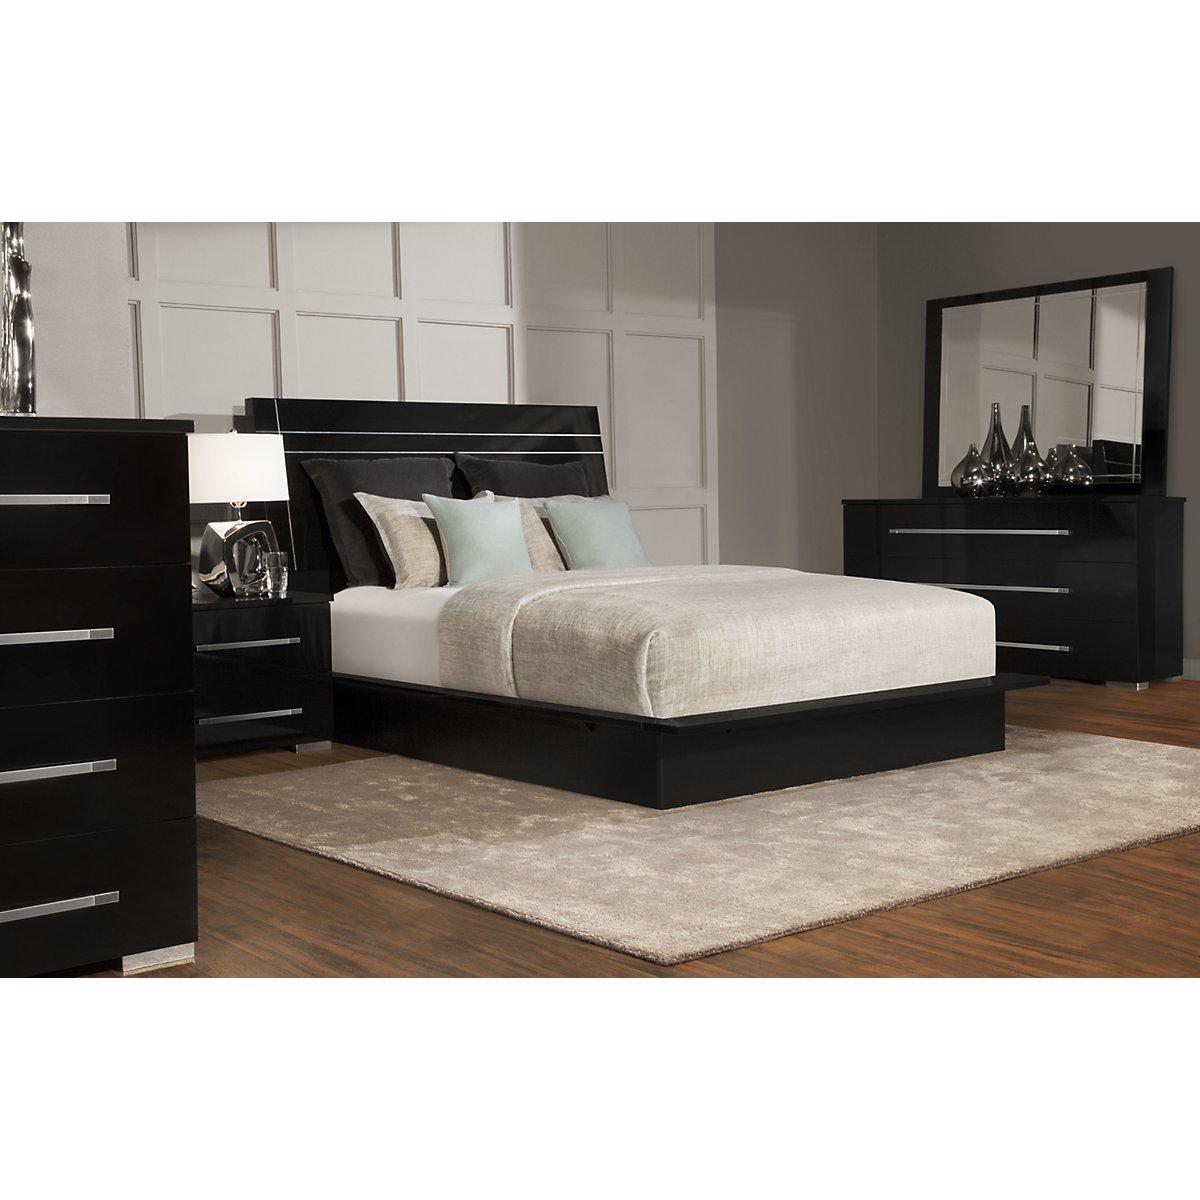 Dimora3 Black Wood Platform Bedroom